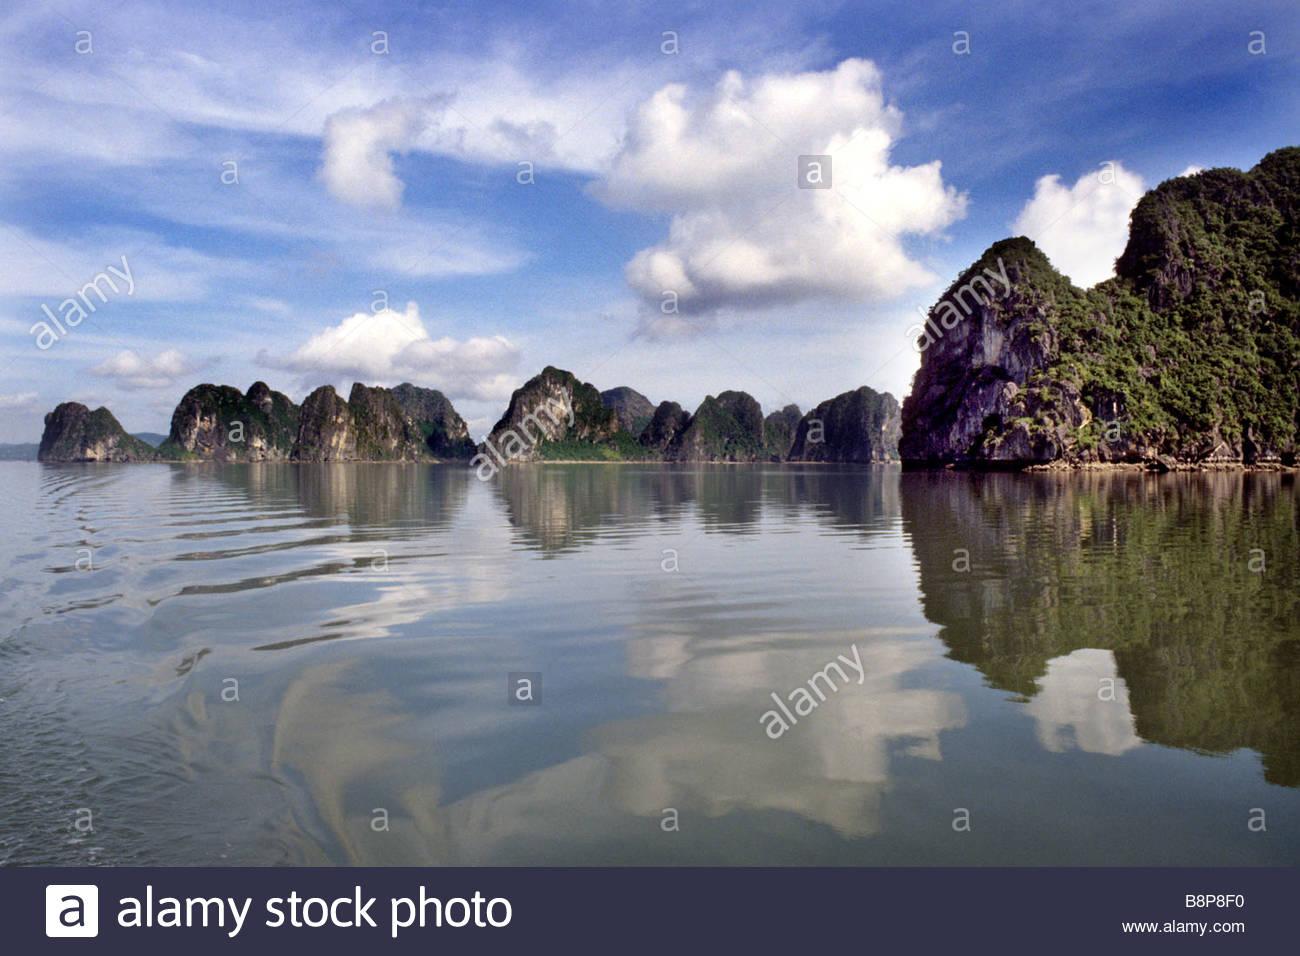 Halong Bay, vietnam, sud-est asiatico Immagini Stock